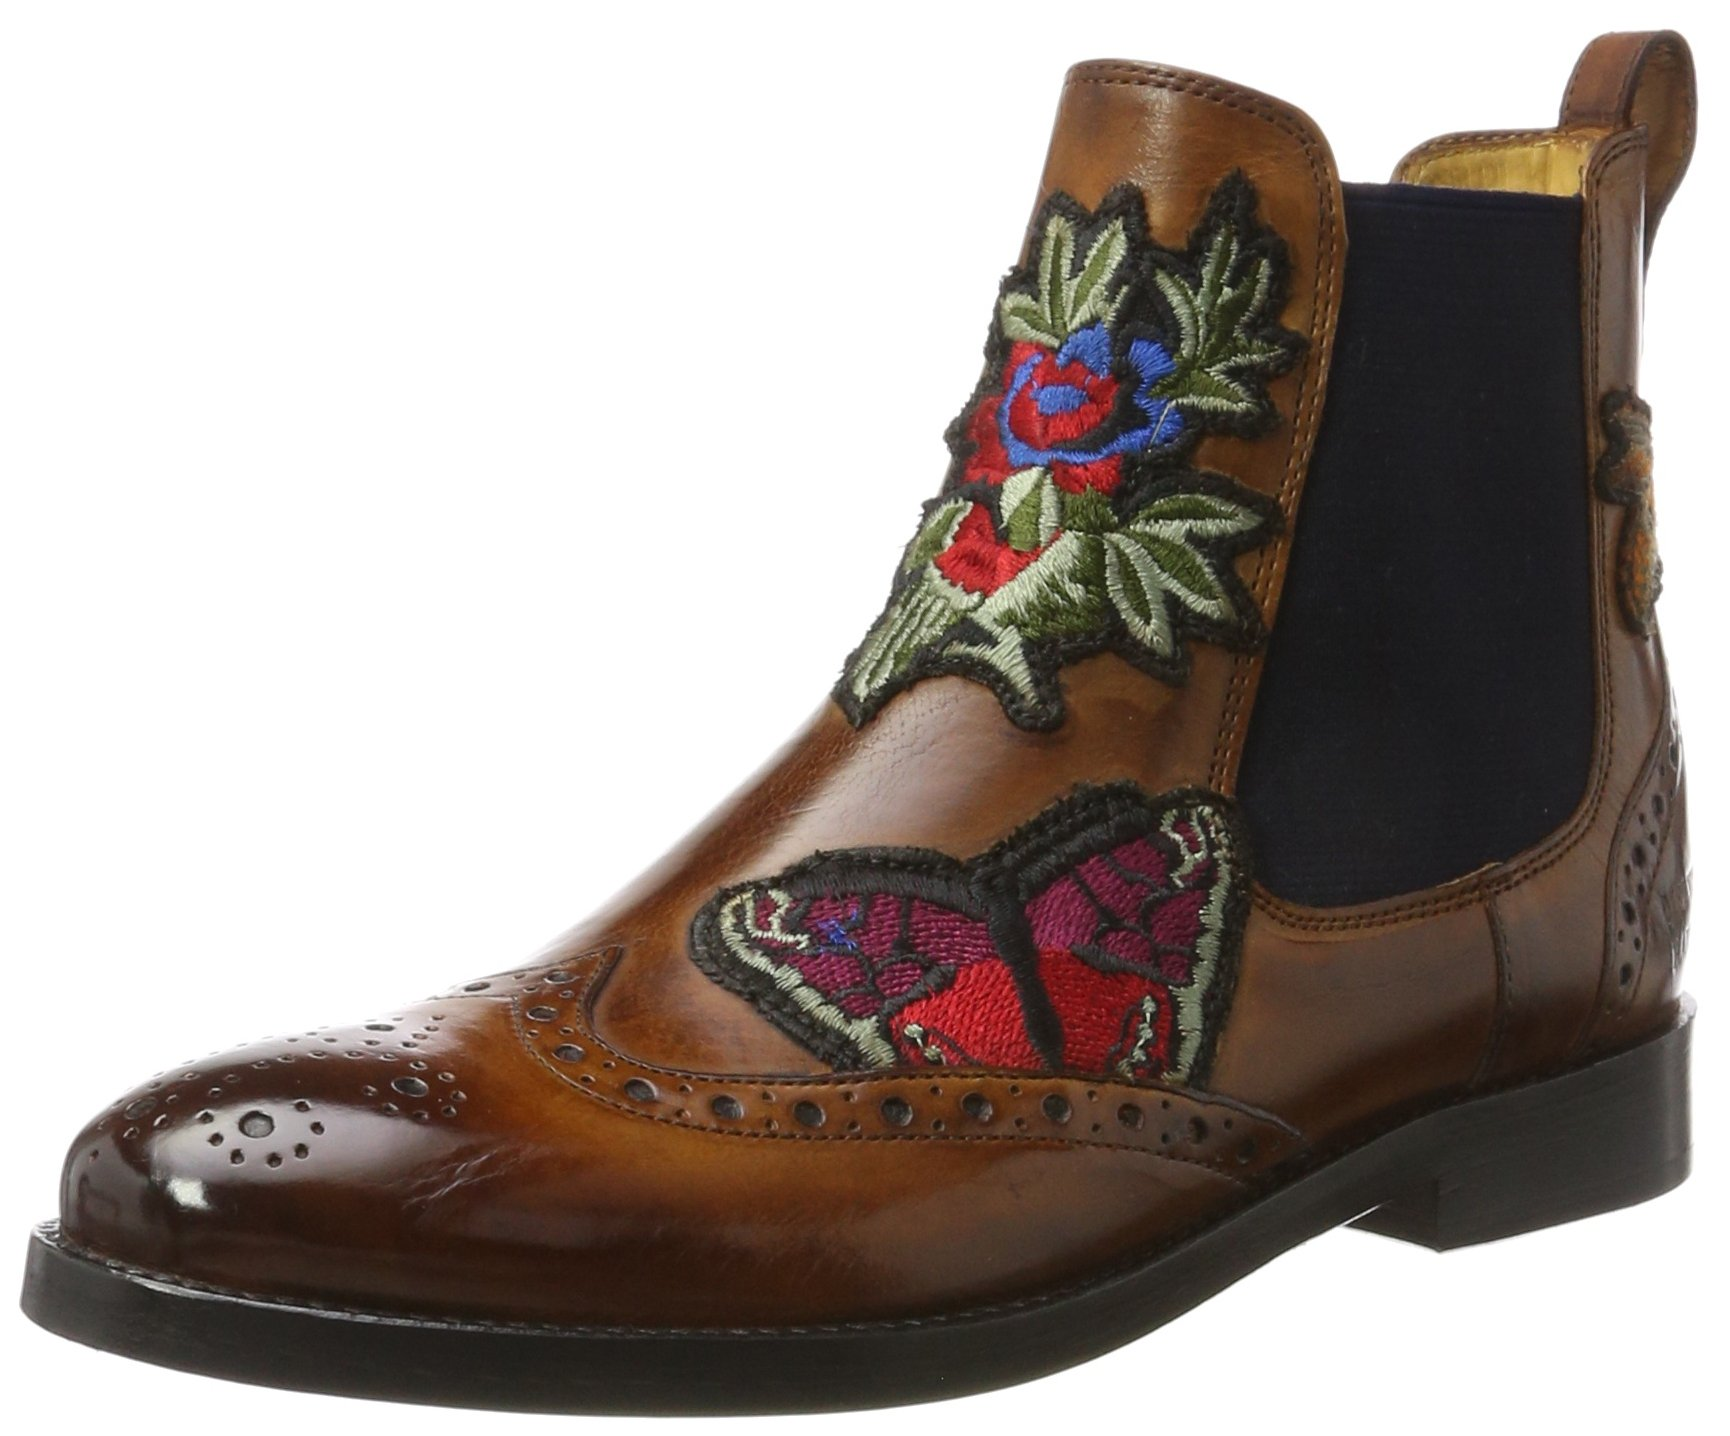 Boots Eu Shoes Of Made Melvinamp; WoodEmbrElastNavyLs Hand FemmeBrauncrust Amelie Mh Hamilton Class 44Chelsea Brw39 7g6fyvIYmb